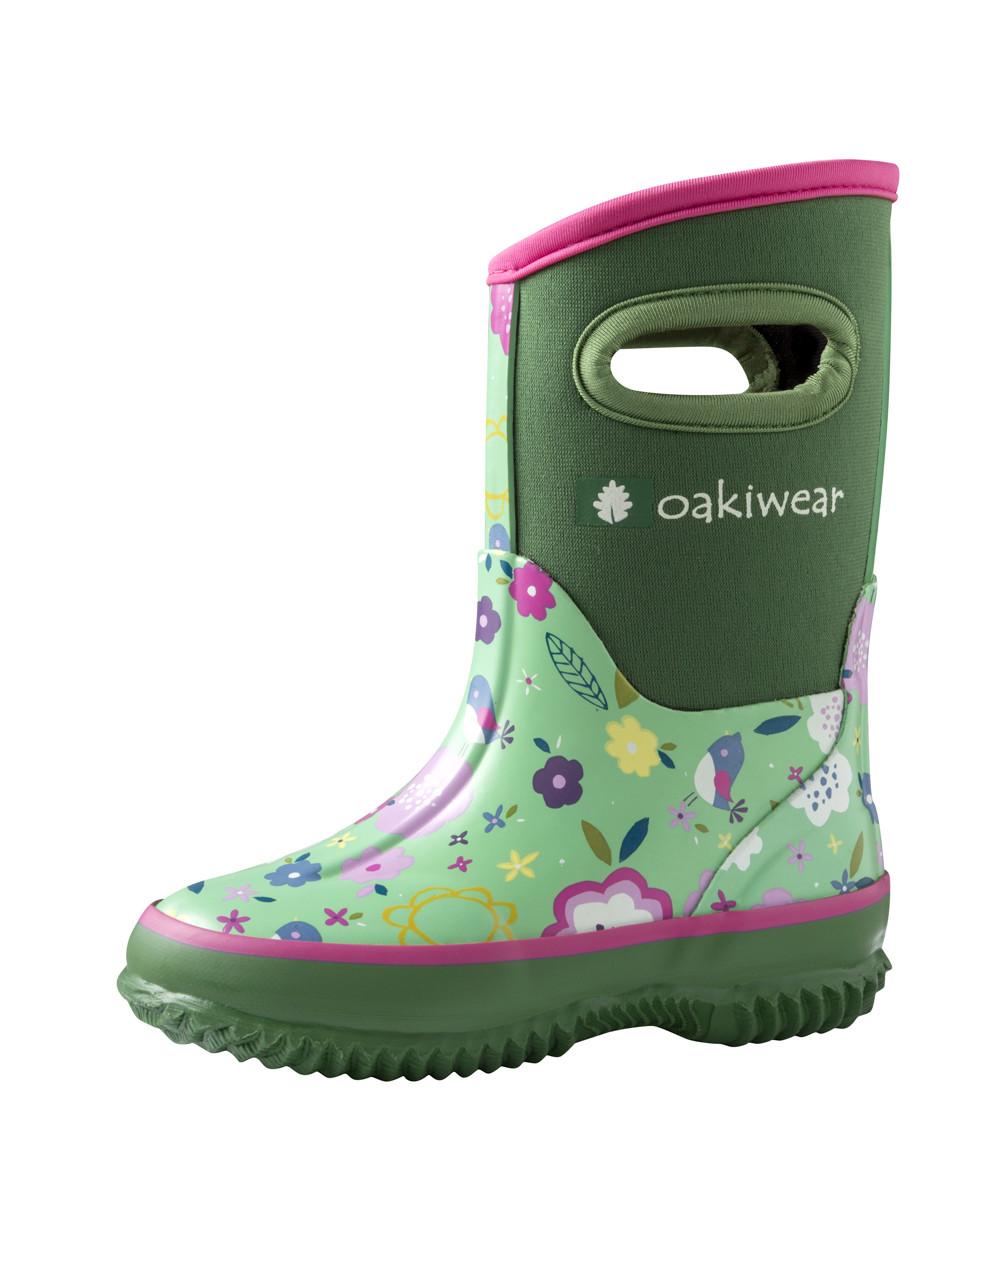 Children's Neoprene Rain/Snow Boots, Green Floral